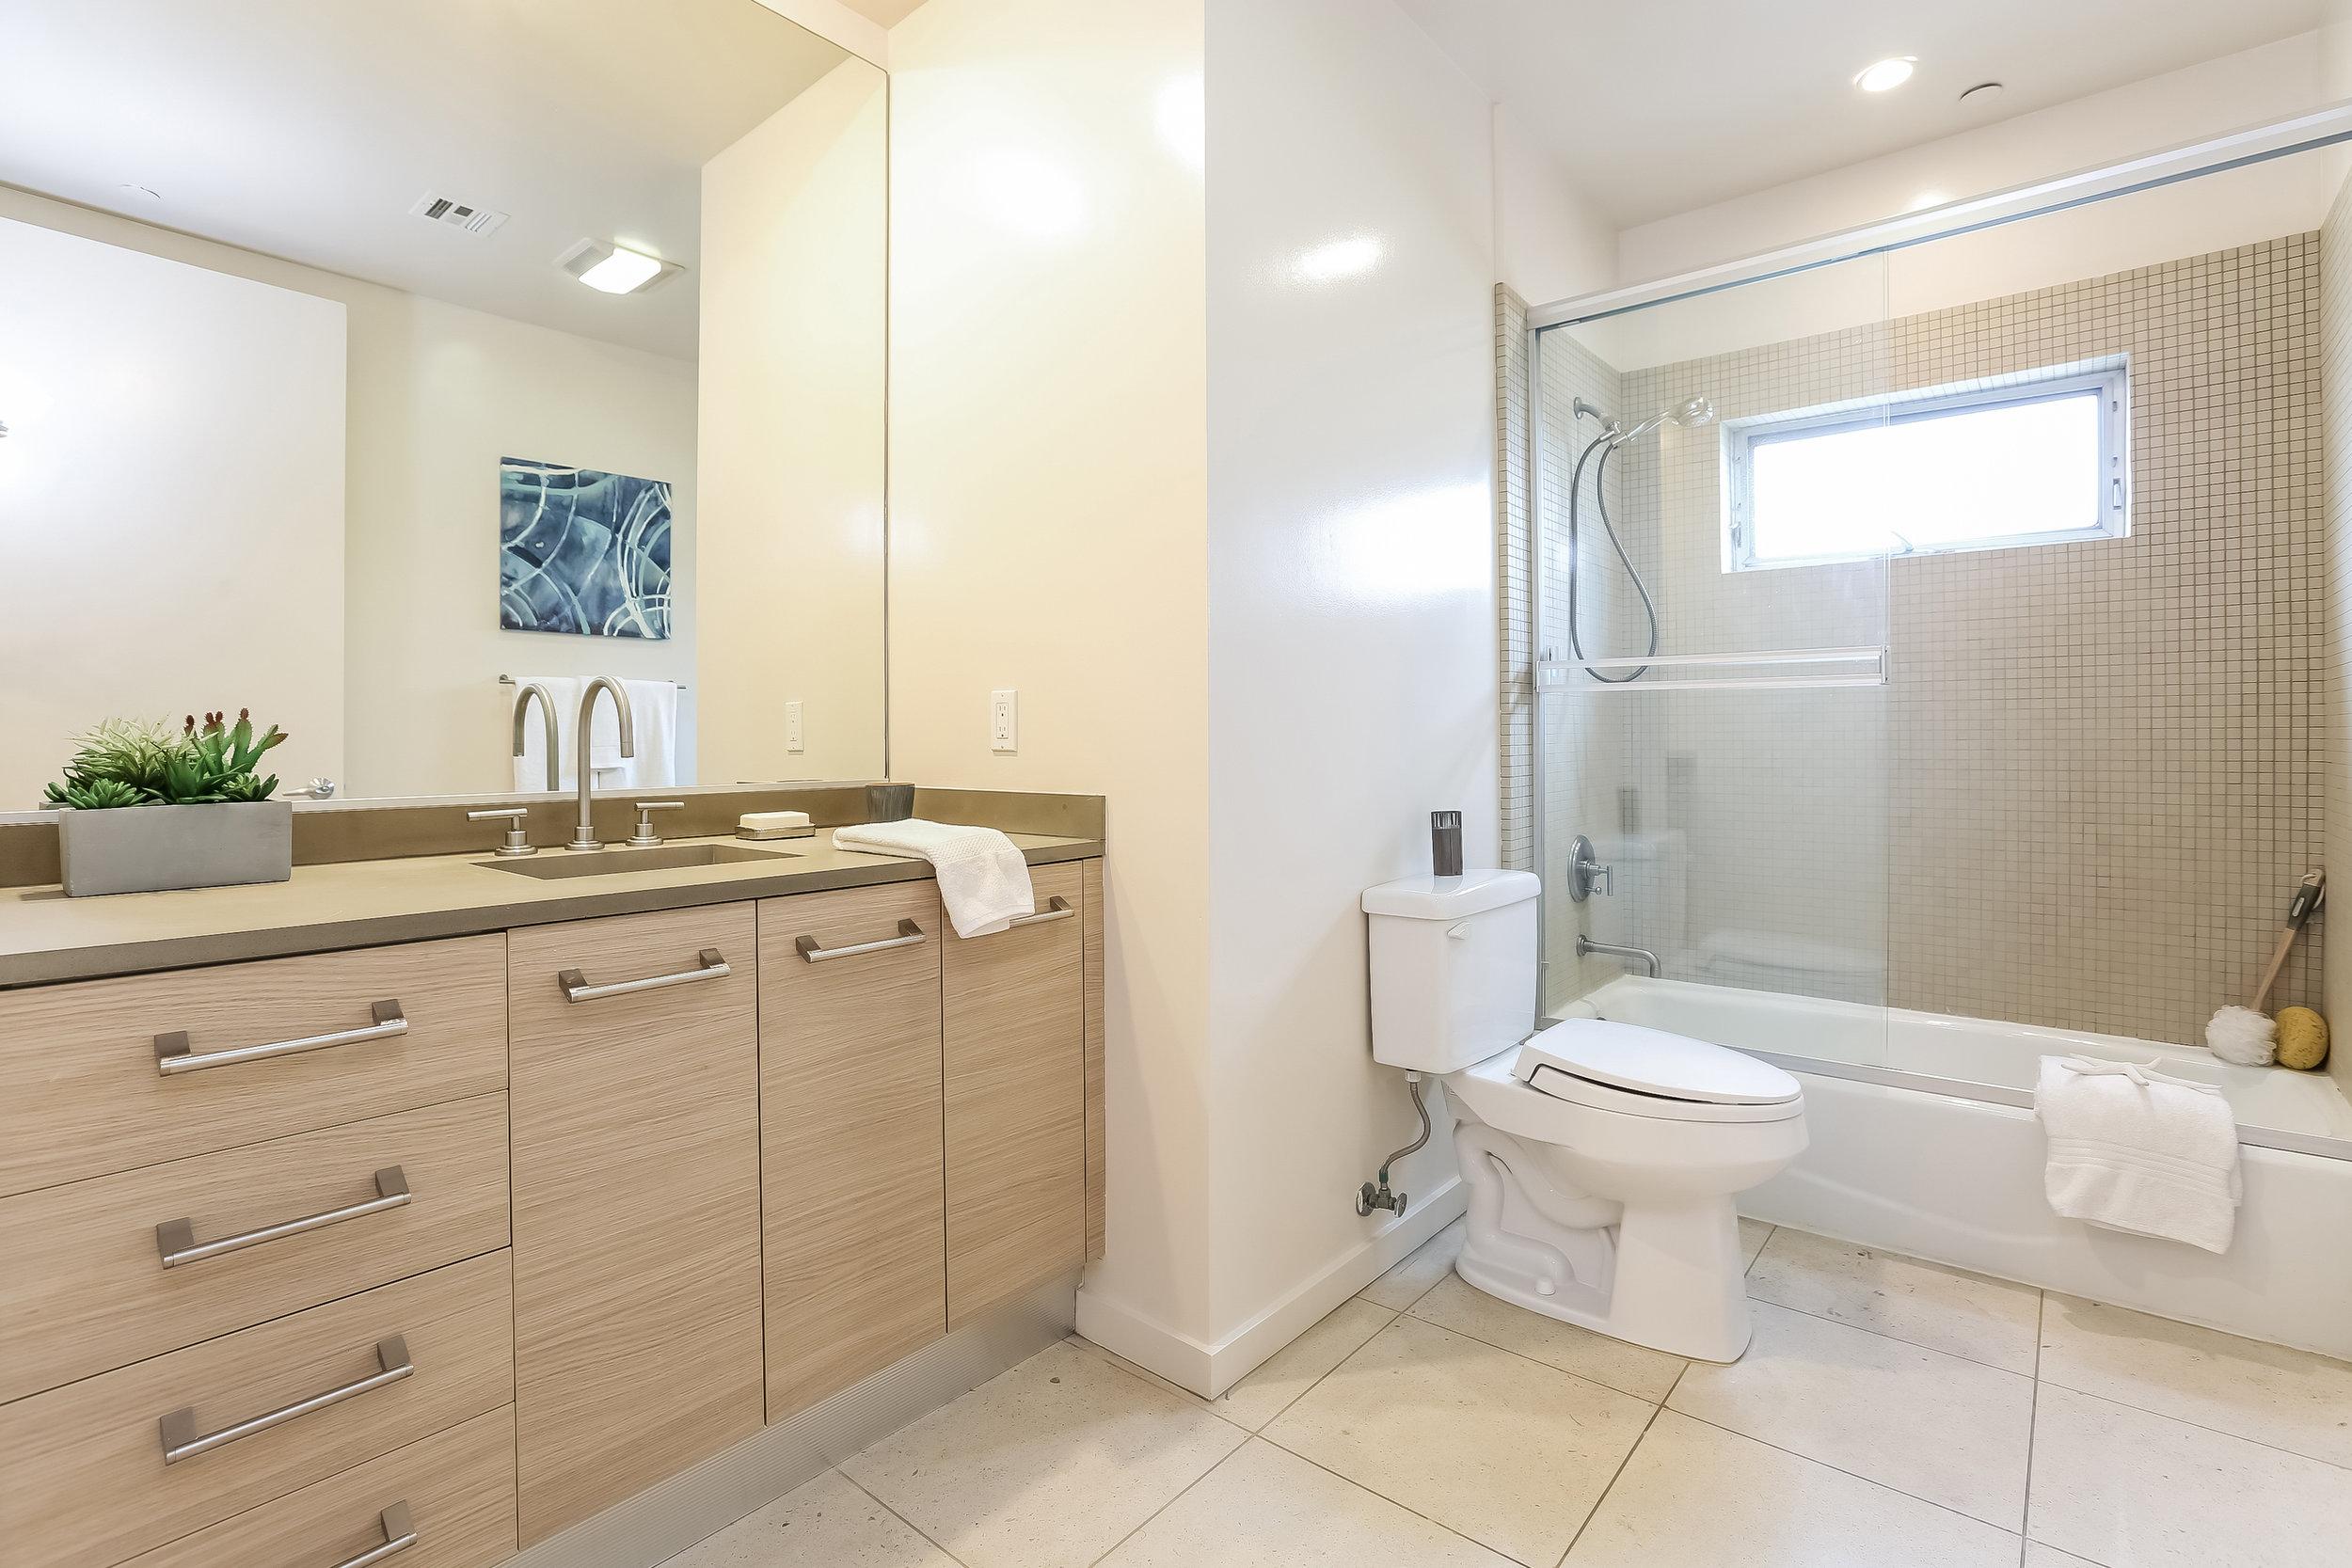 026-photo-bathroom-6209677 copy.jpg